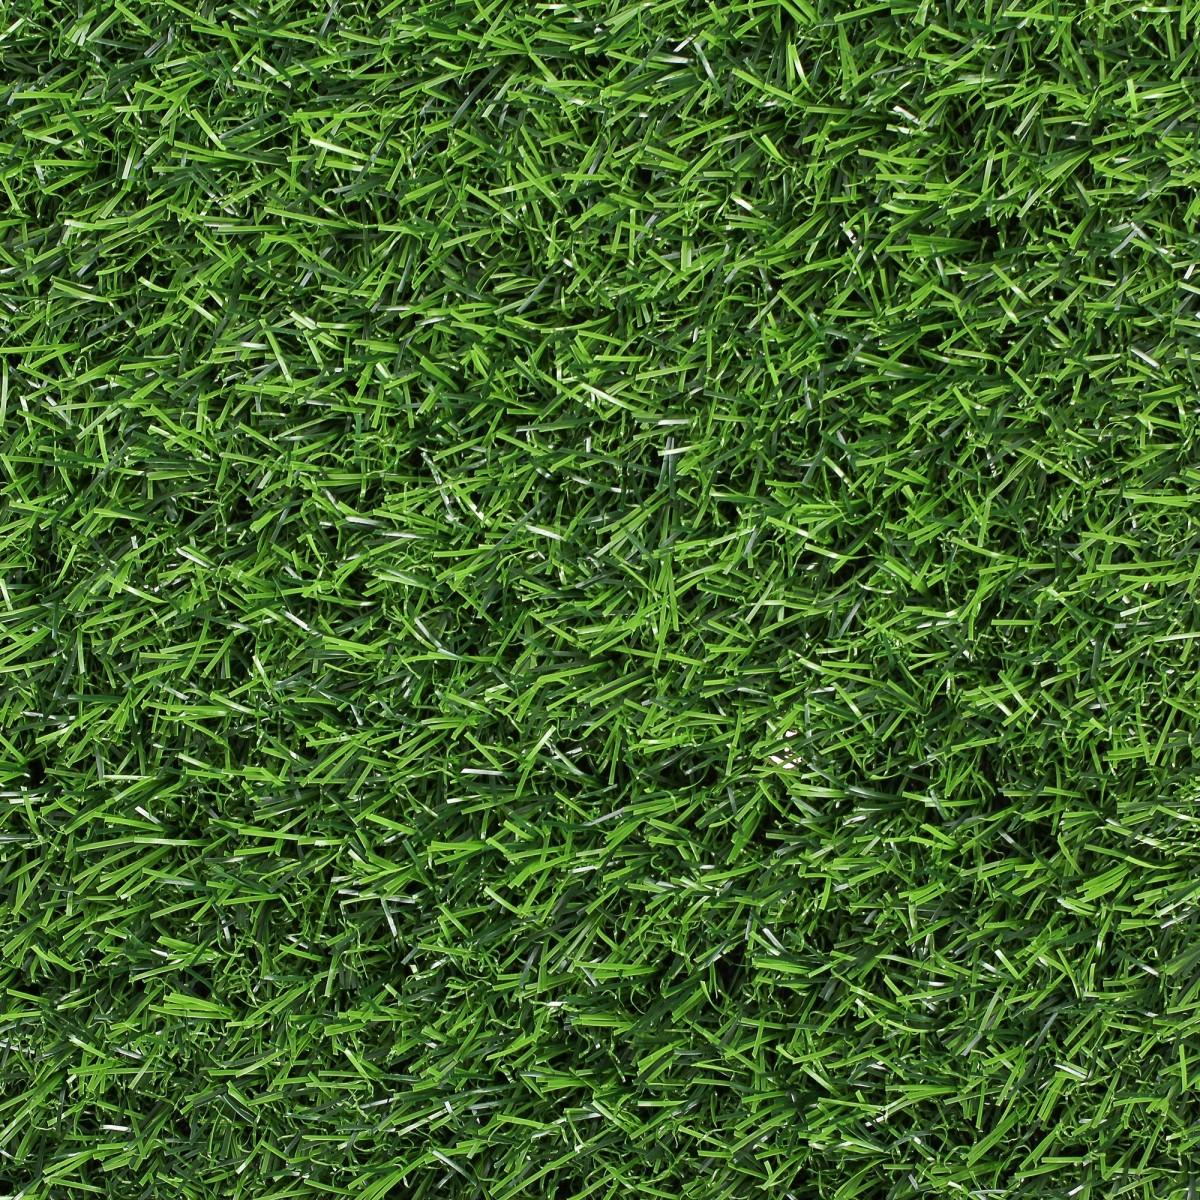 Искусственная трава LG005 20 мм 1х2 м